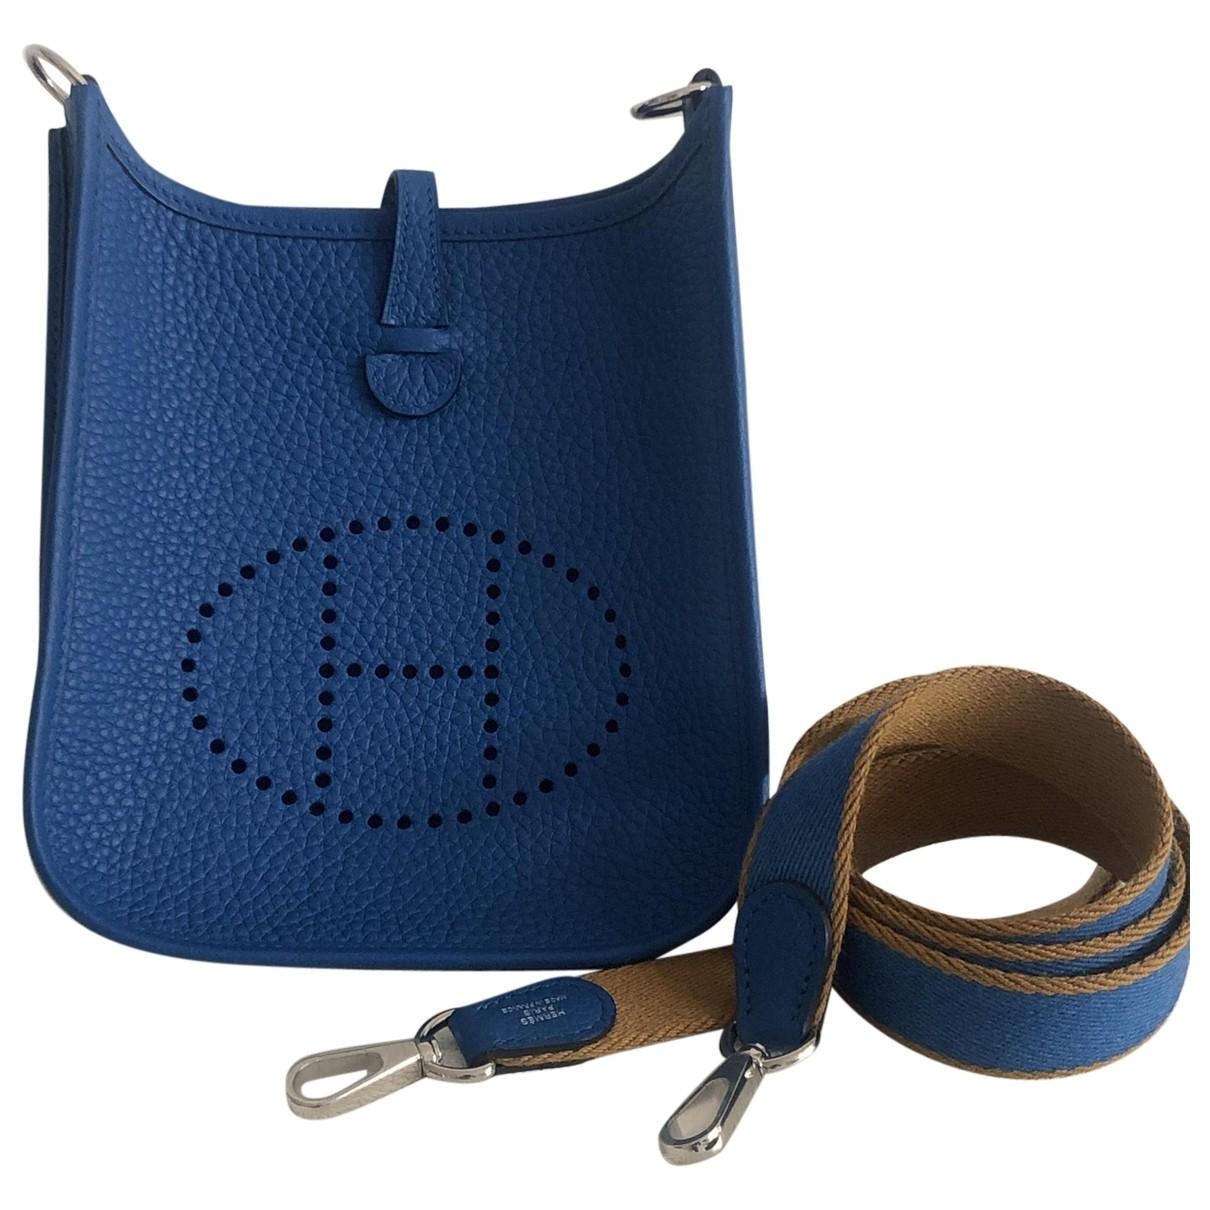 Hermes - Sac a main Evelyne pour femme en cuir - bleu